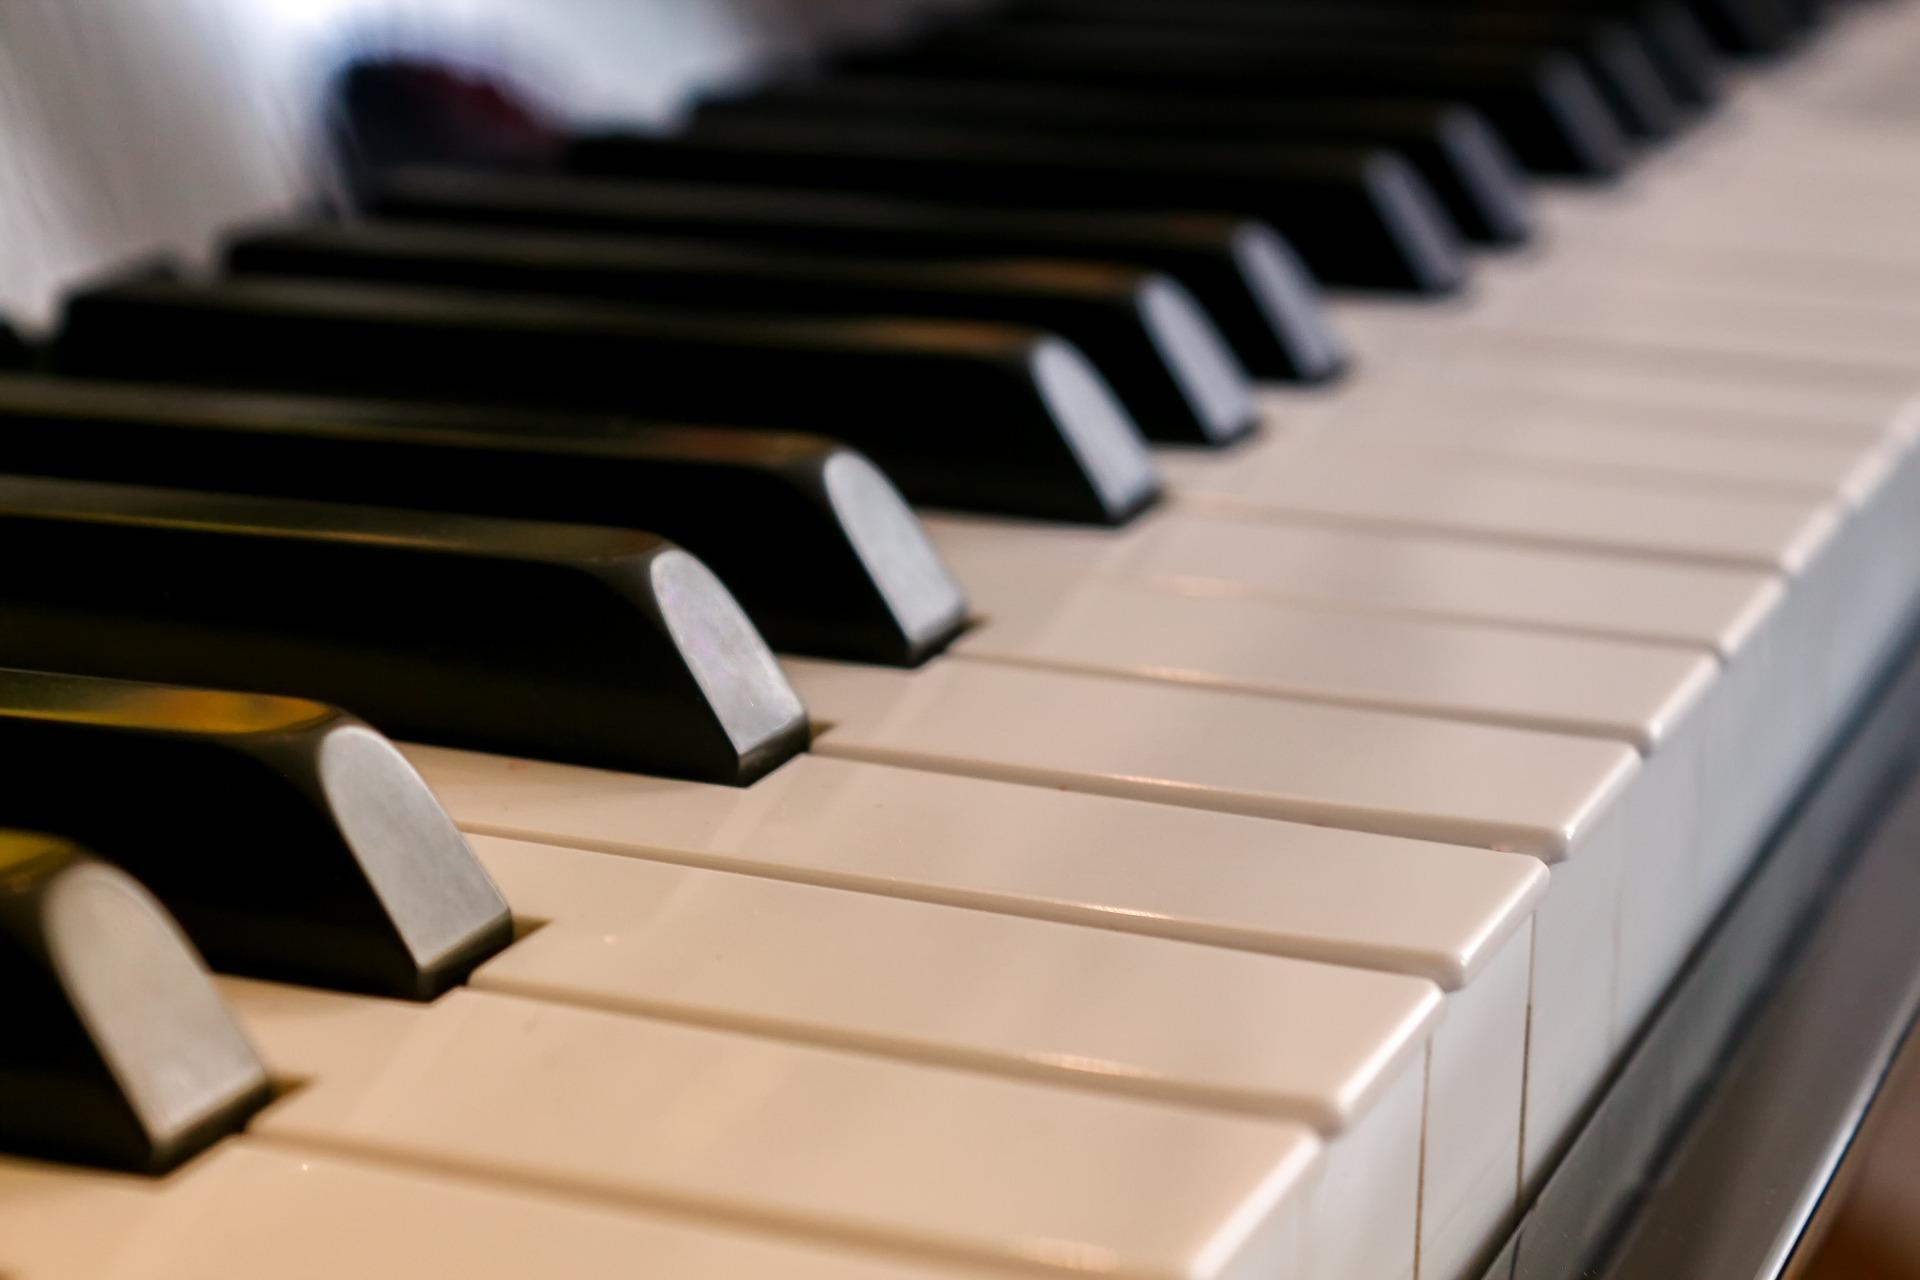 Tampereen konservatorion pianoilta